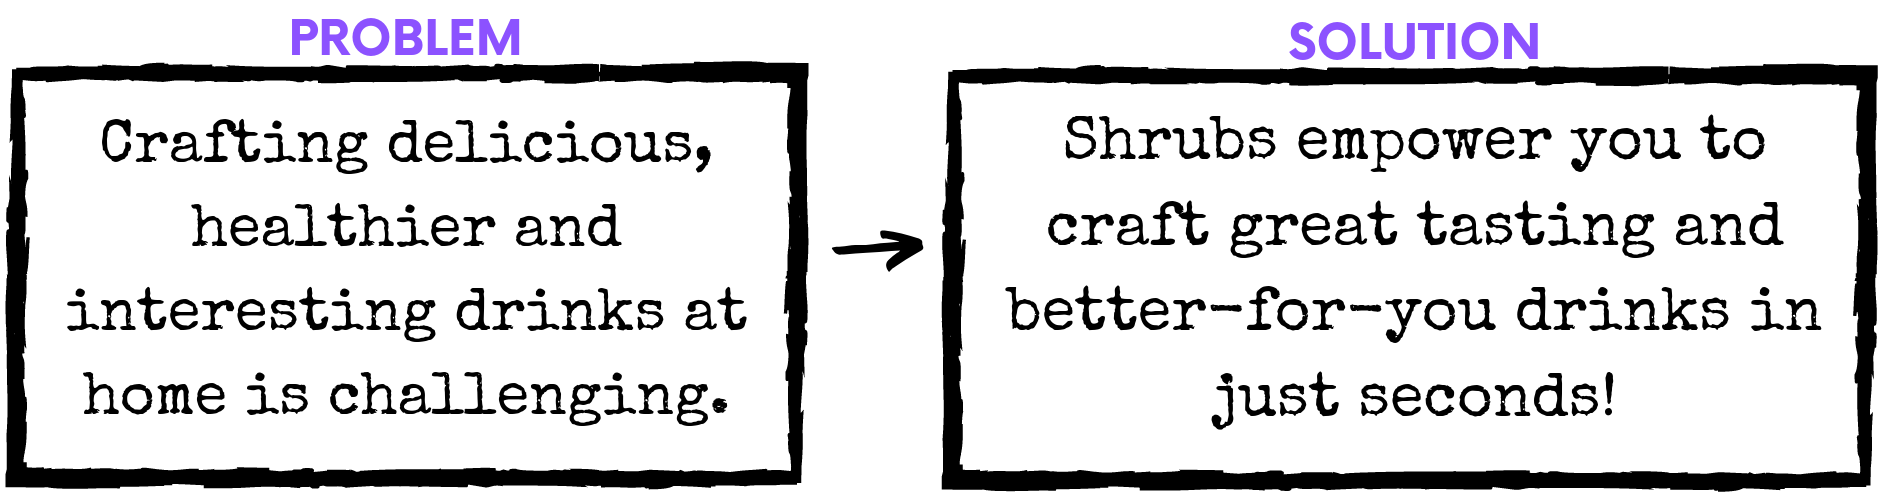 Problem-Solution SHRUB.png